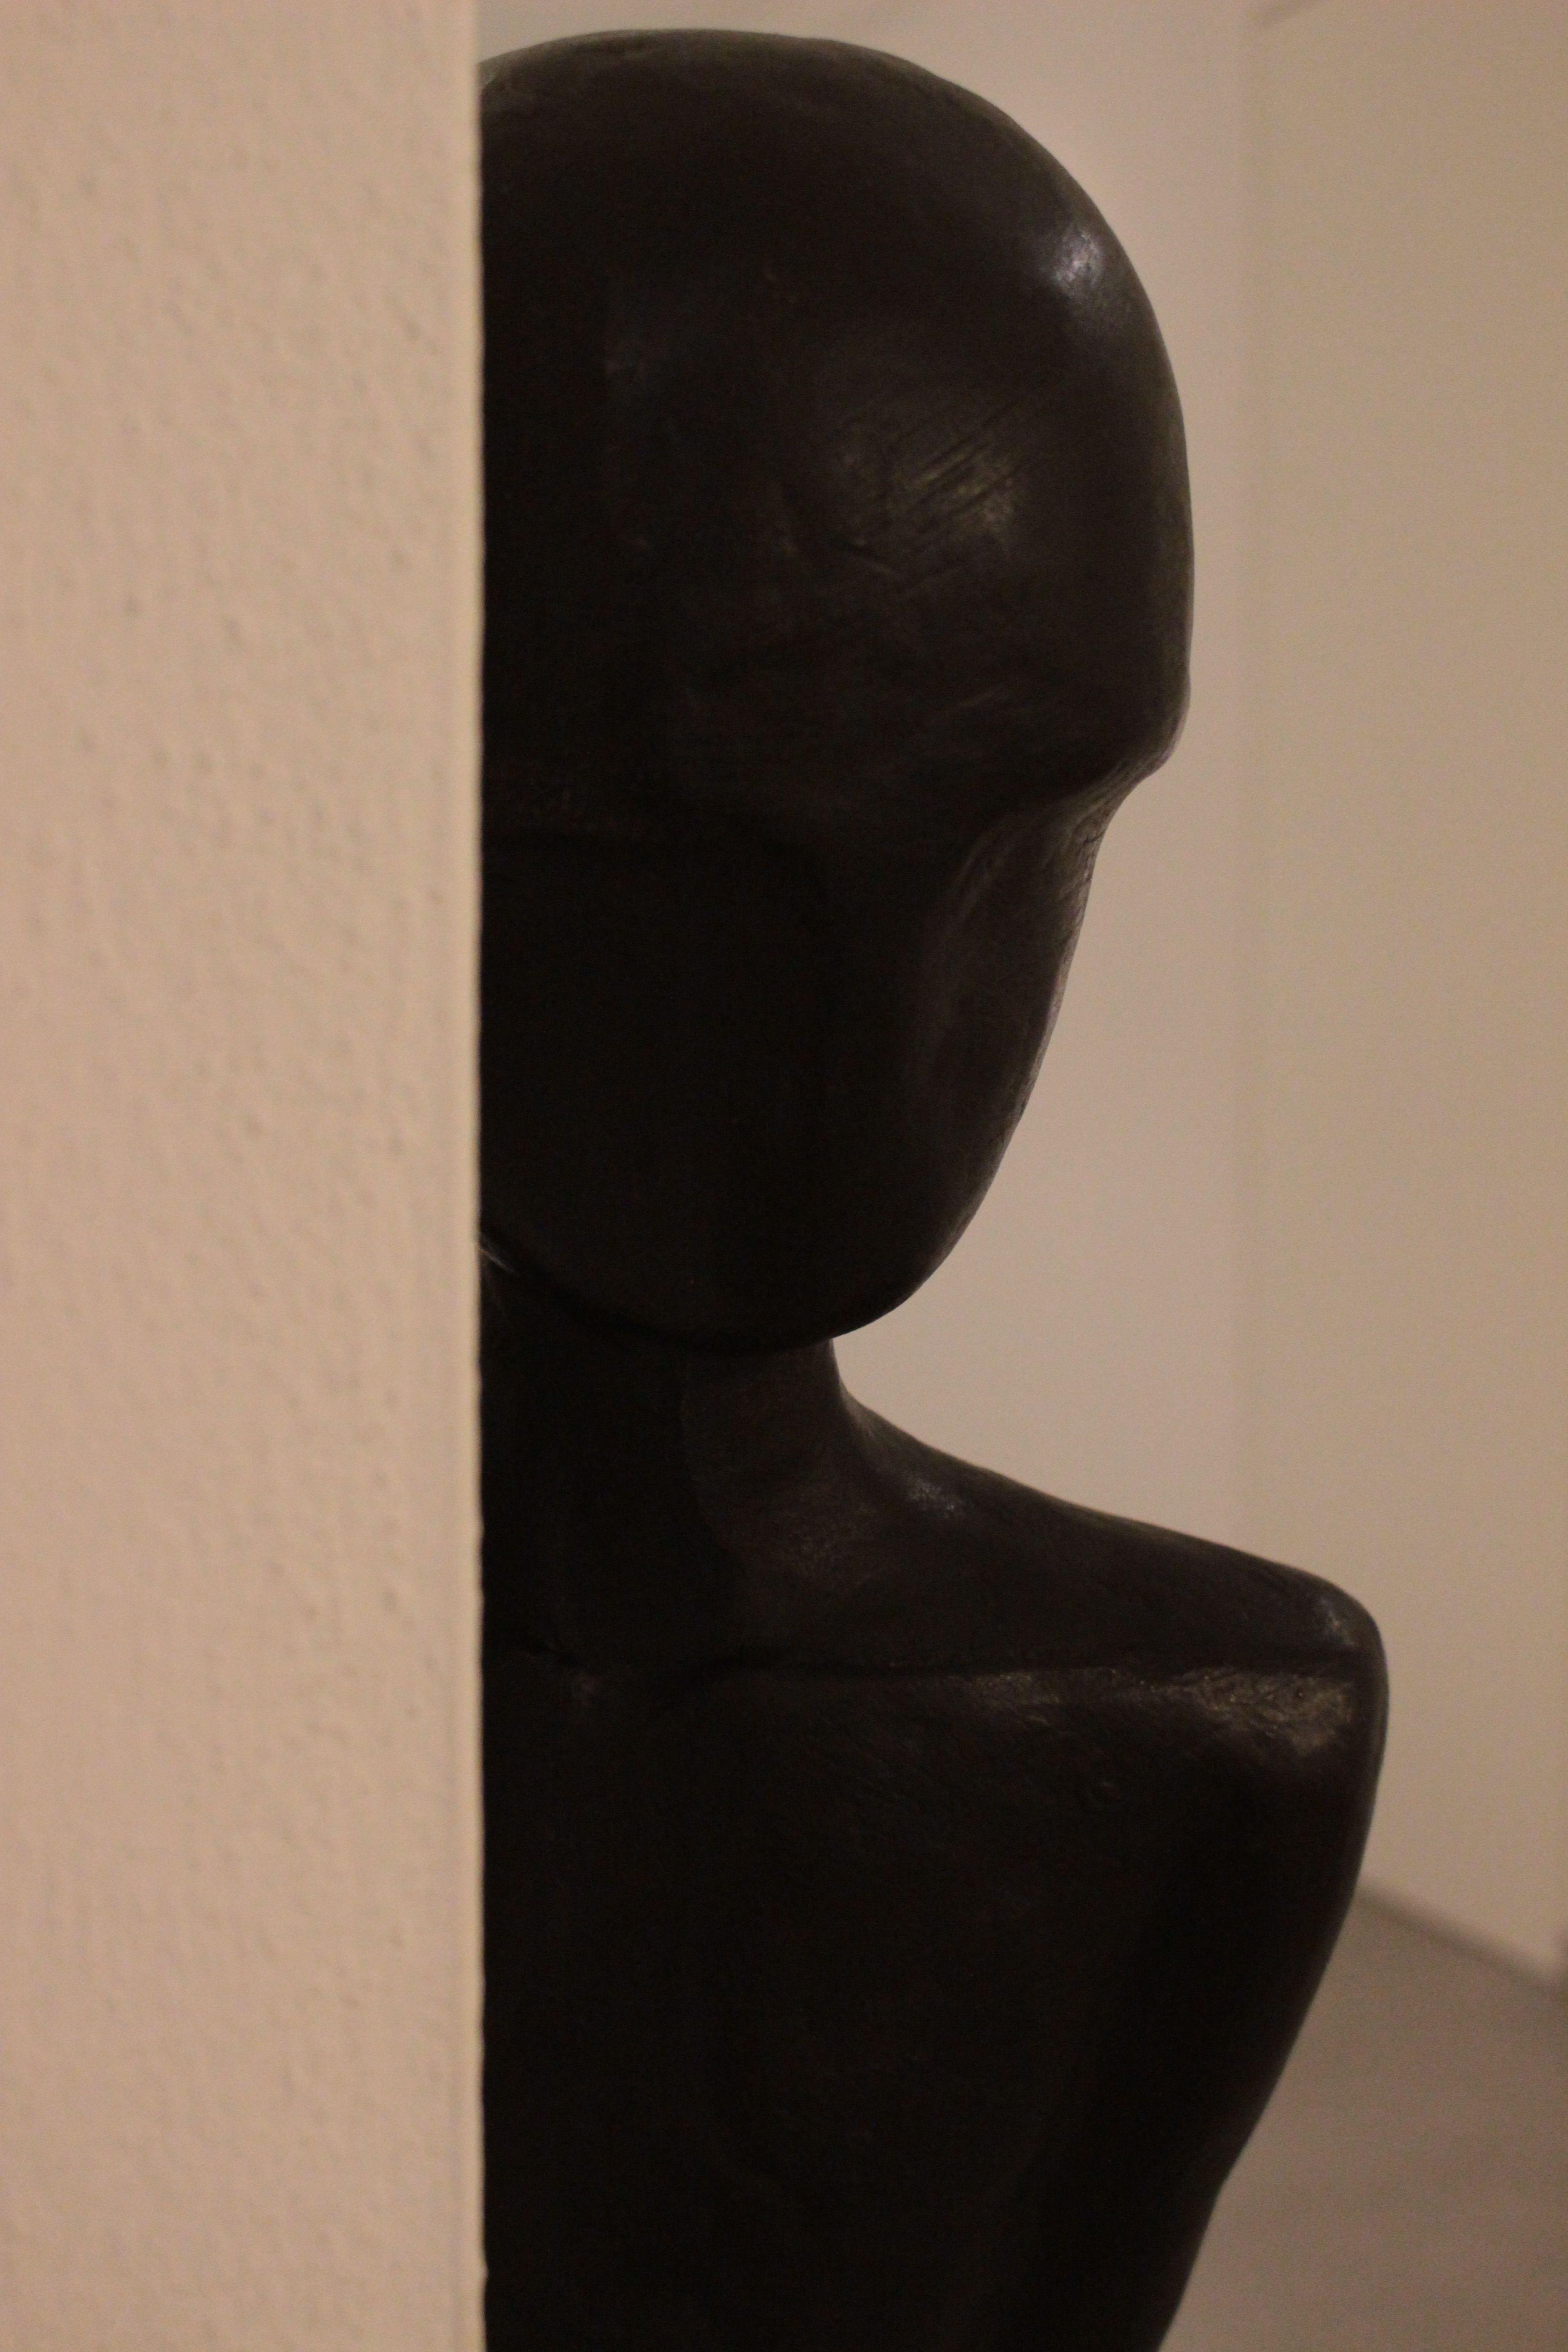 Alex Pinna, Waiting for (detail), 2011, bronzo patinato, 30x163x18 cm #contemporary #art #sculpture